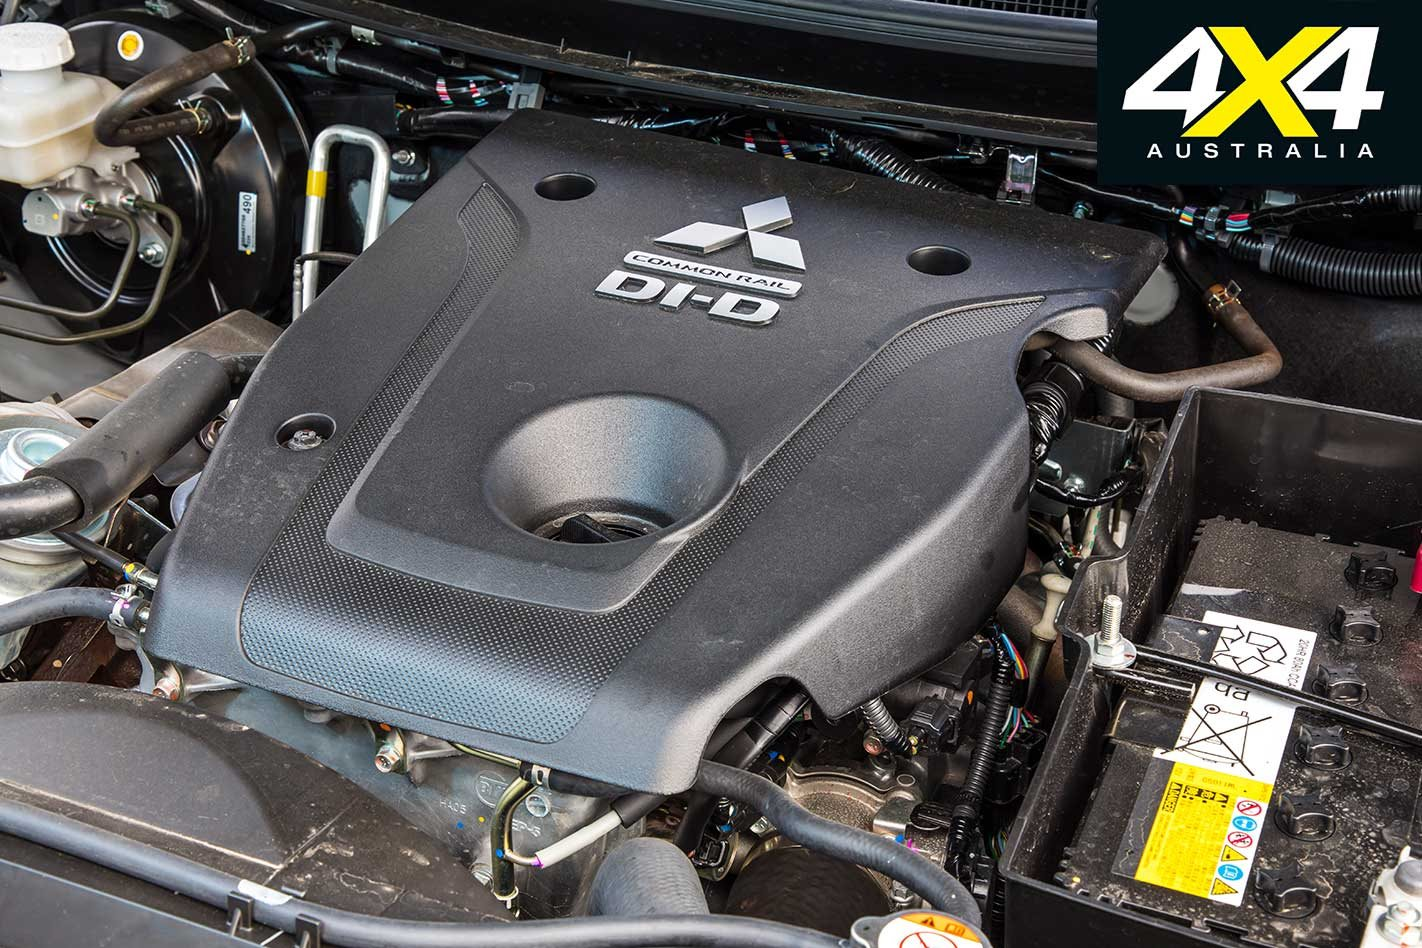 2018 Isuzu MU-X vs Mitsubishi Pajero Sport 4x4 comparison review